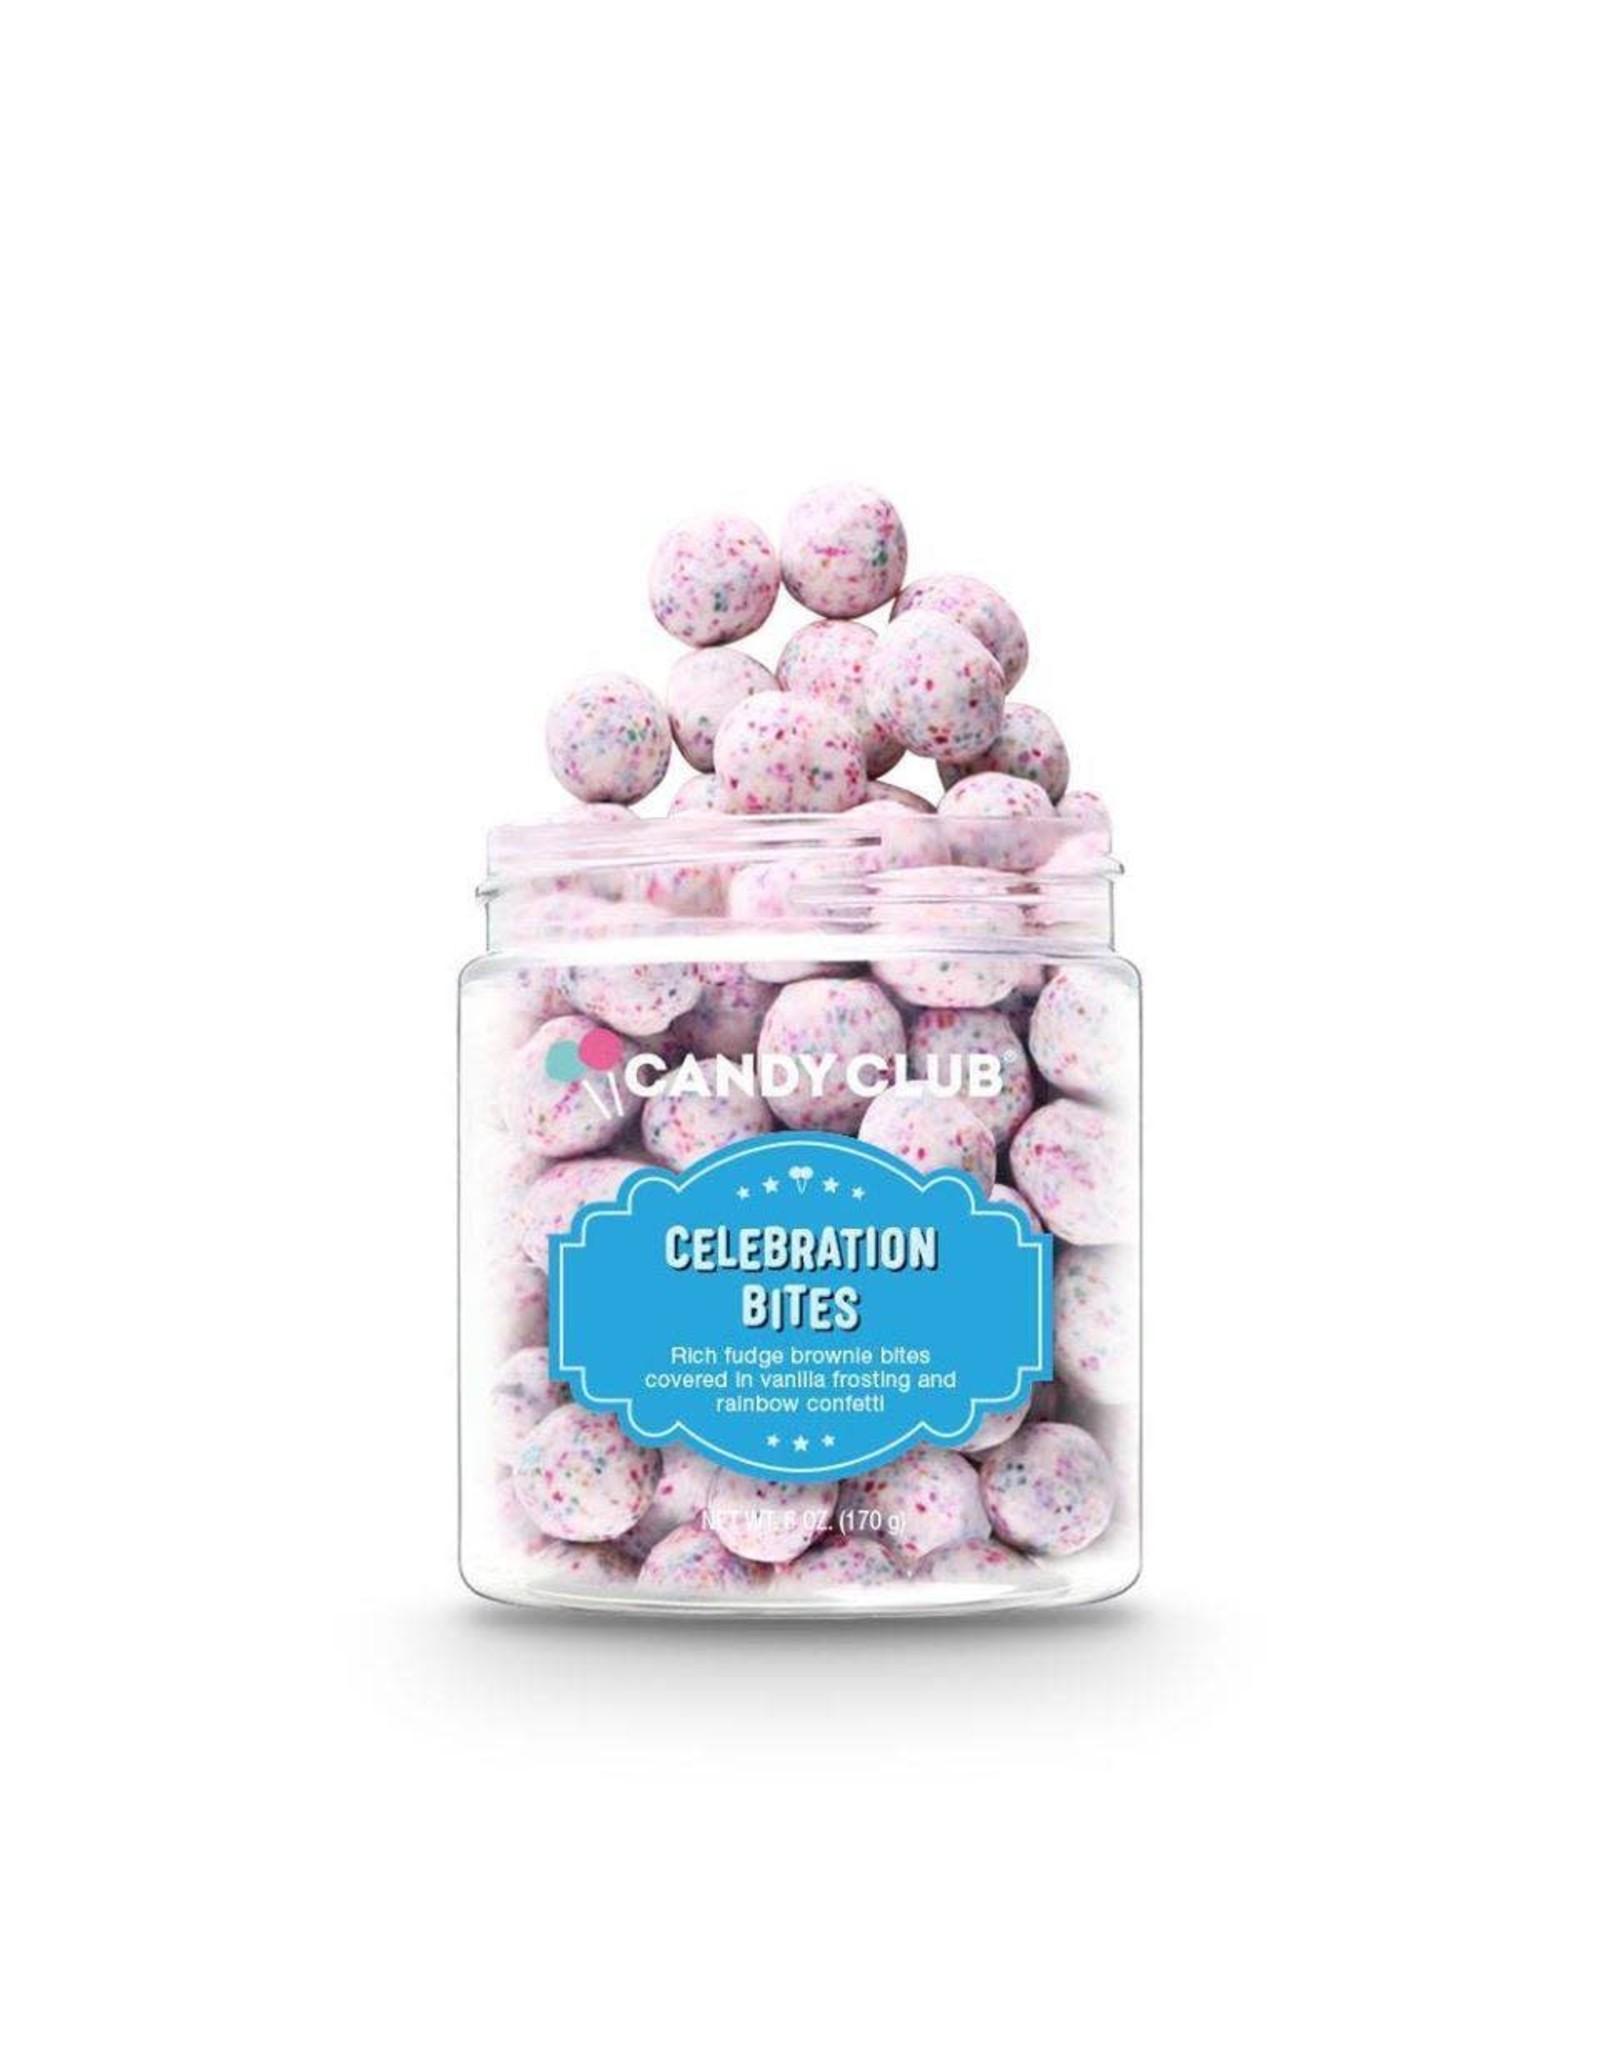 Candy Club Candy, Celebration Bites, 6oz